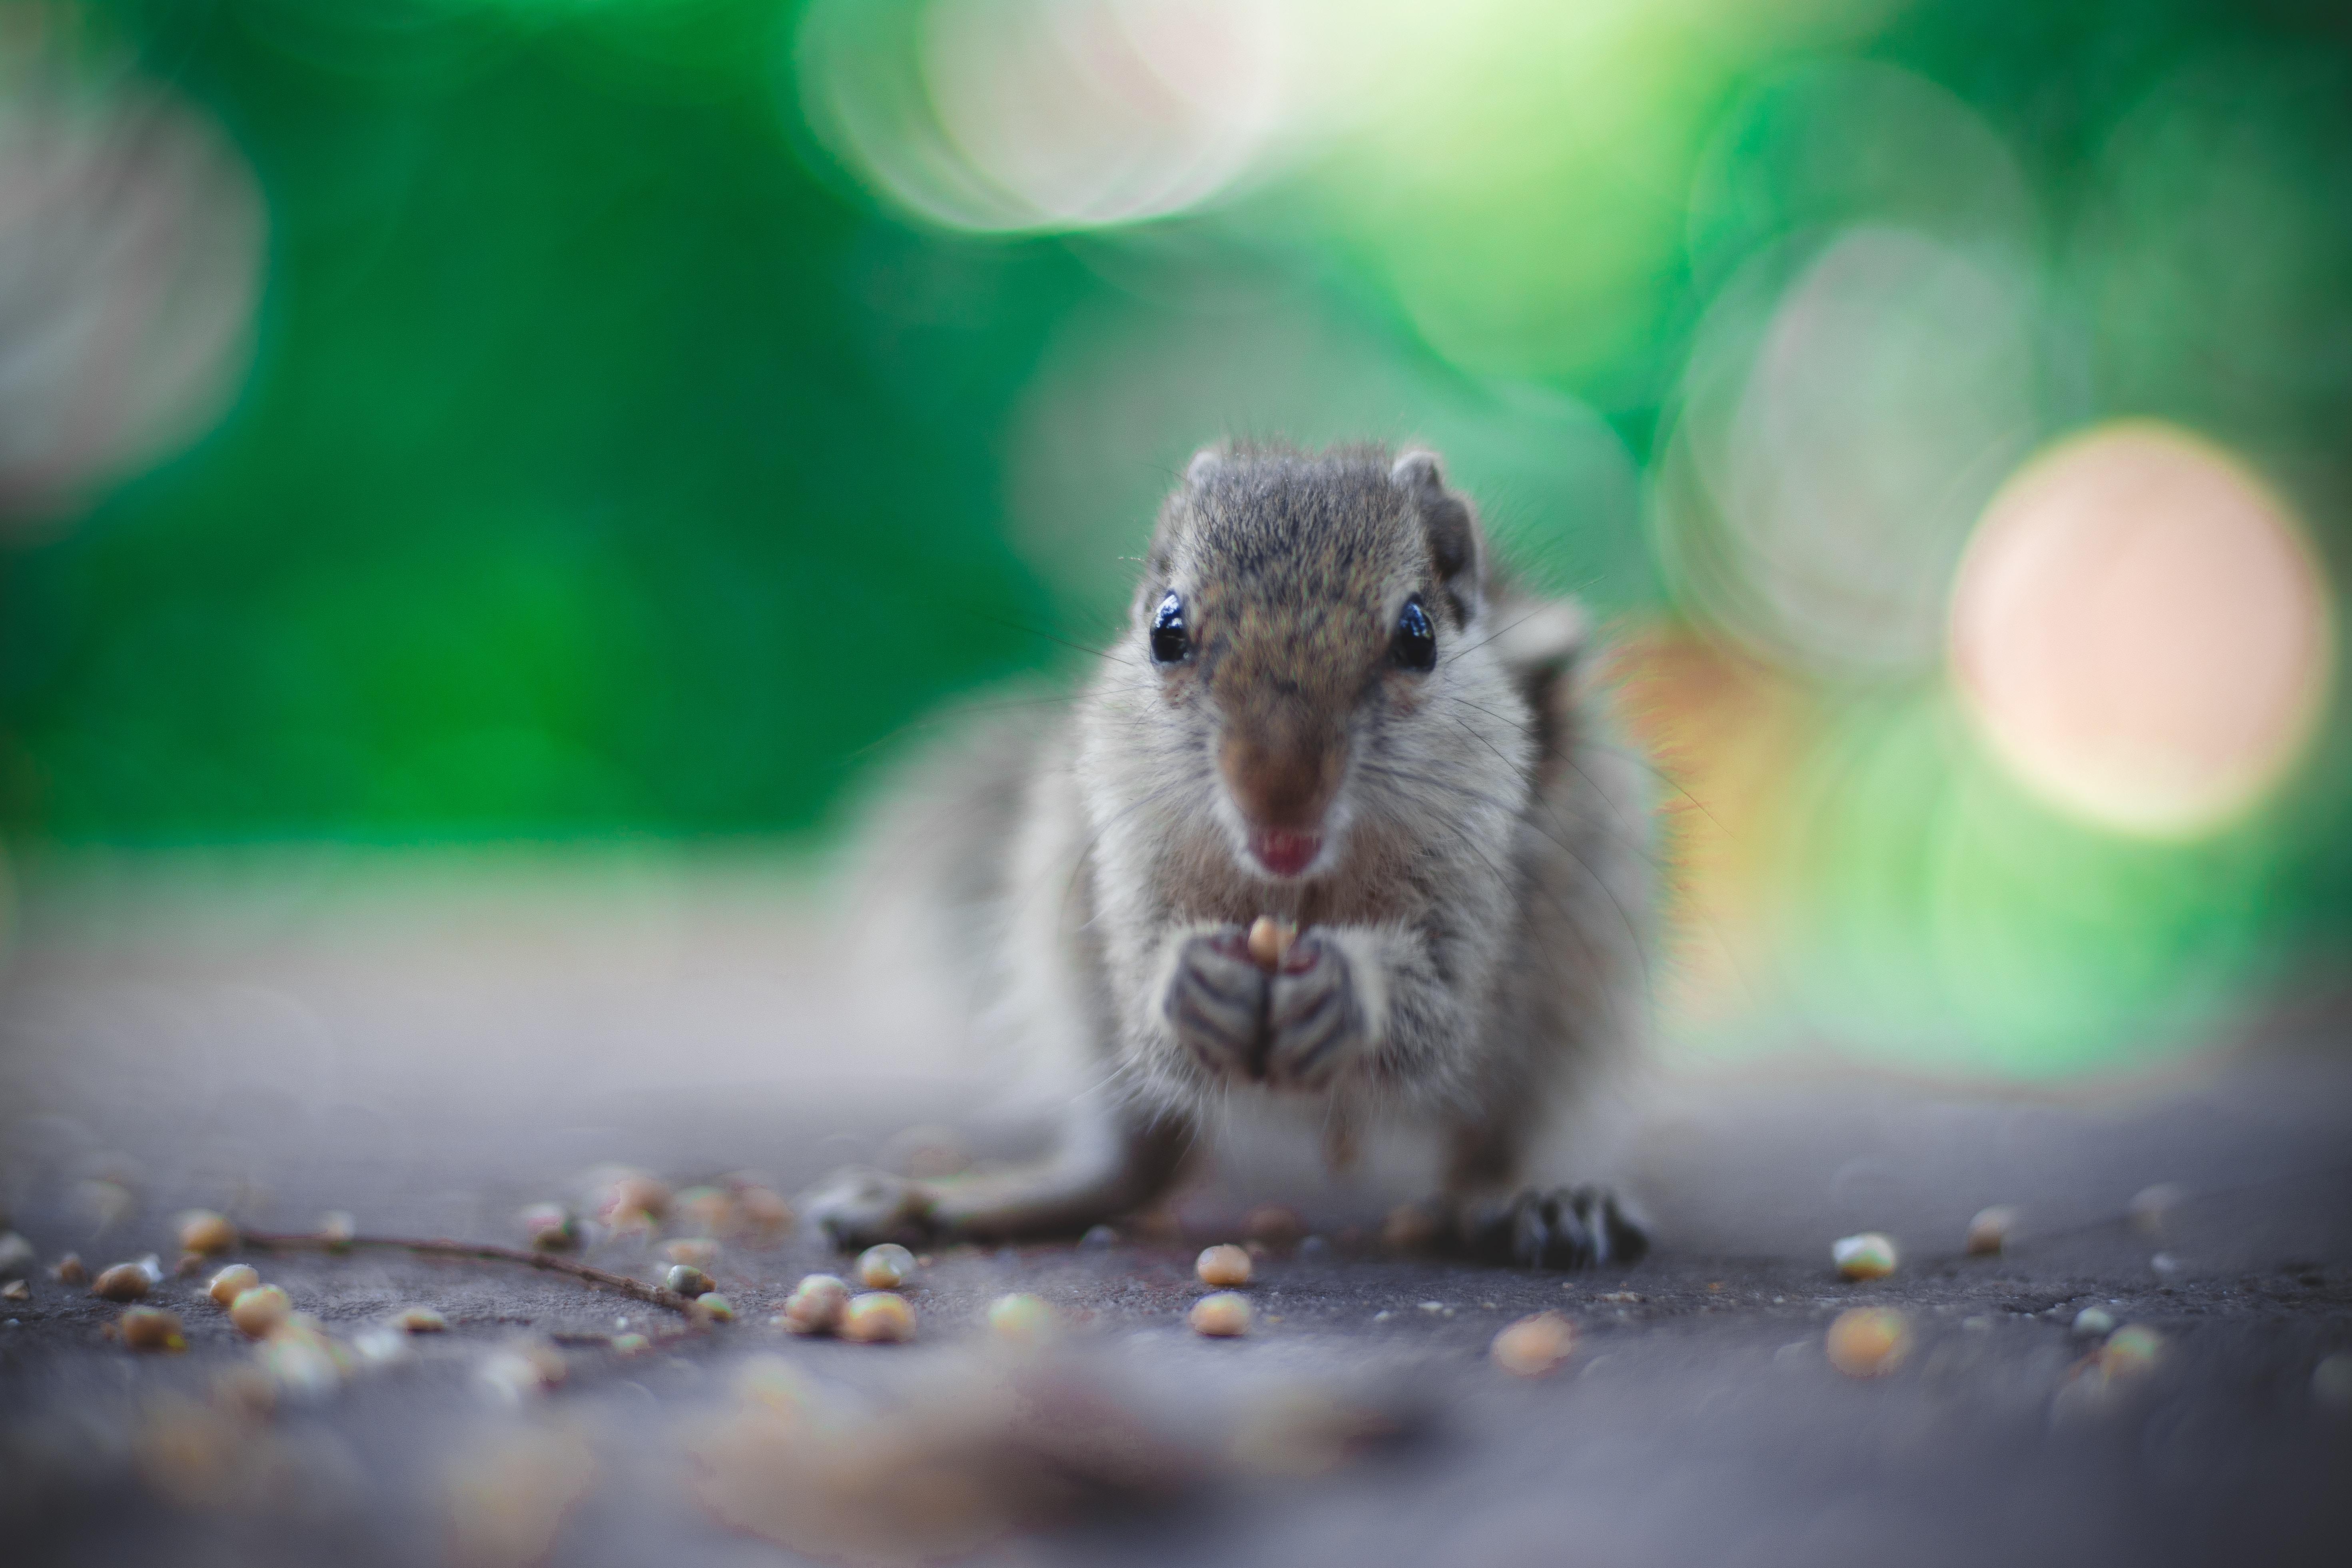 closeup photo of rodent